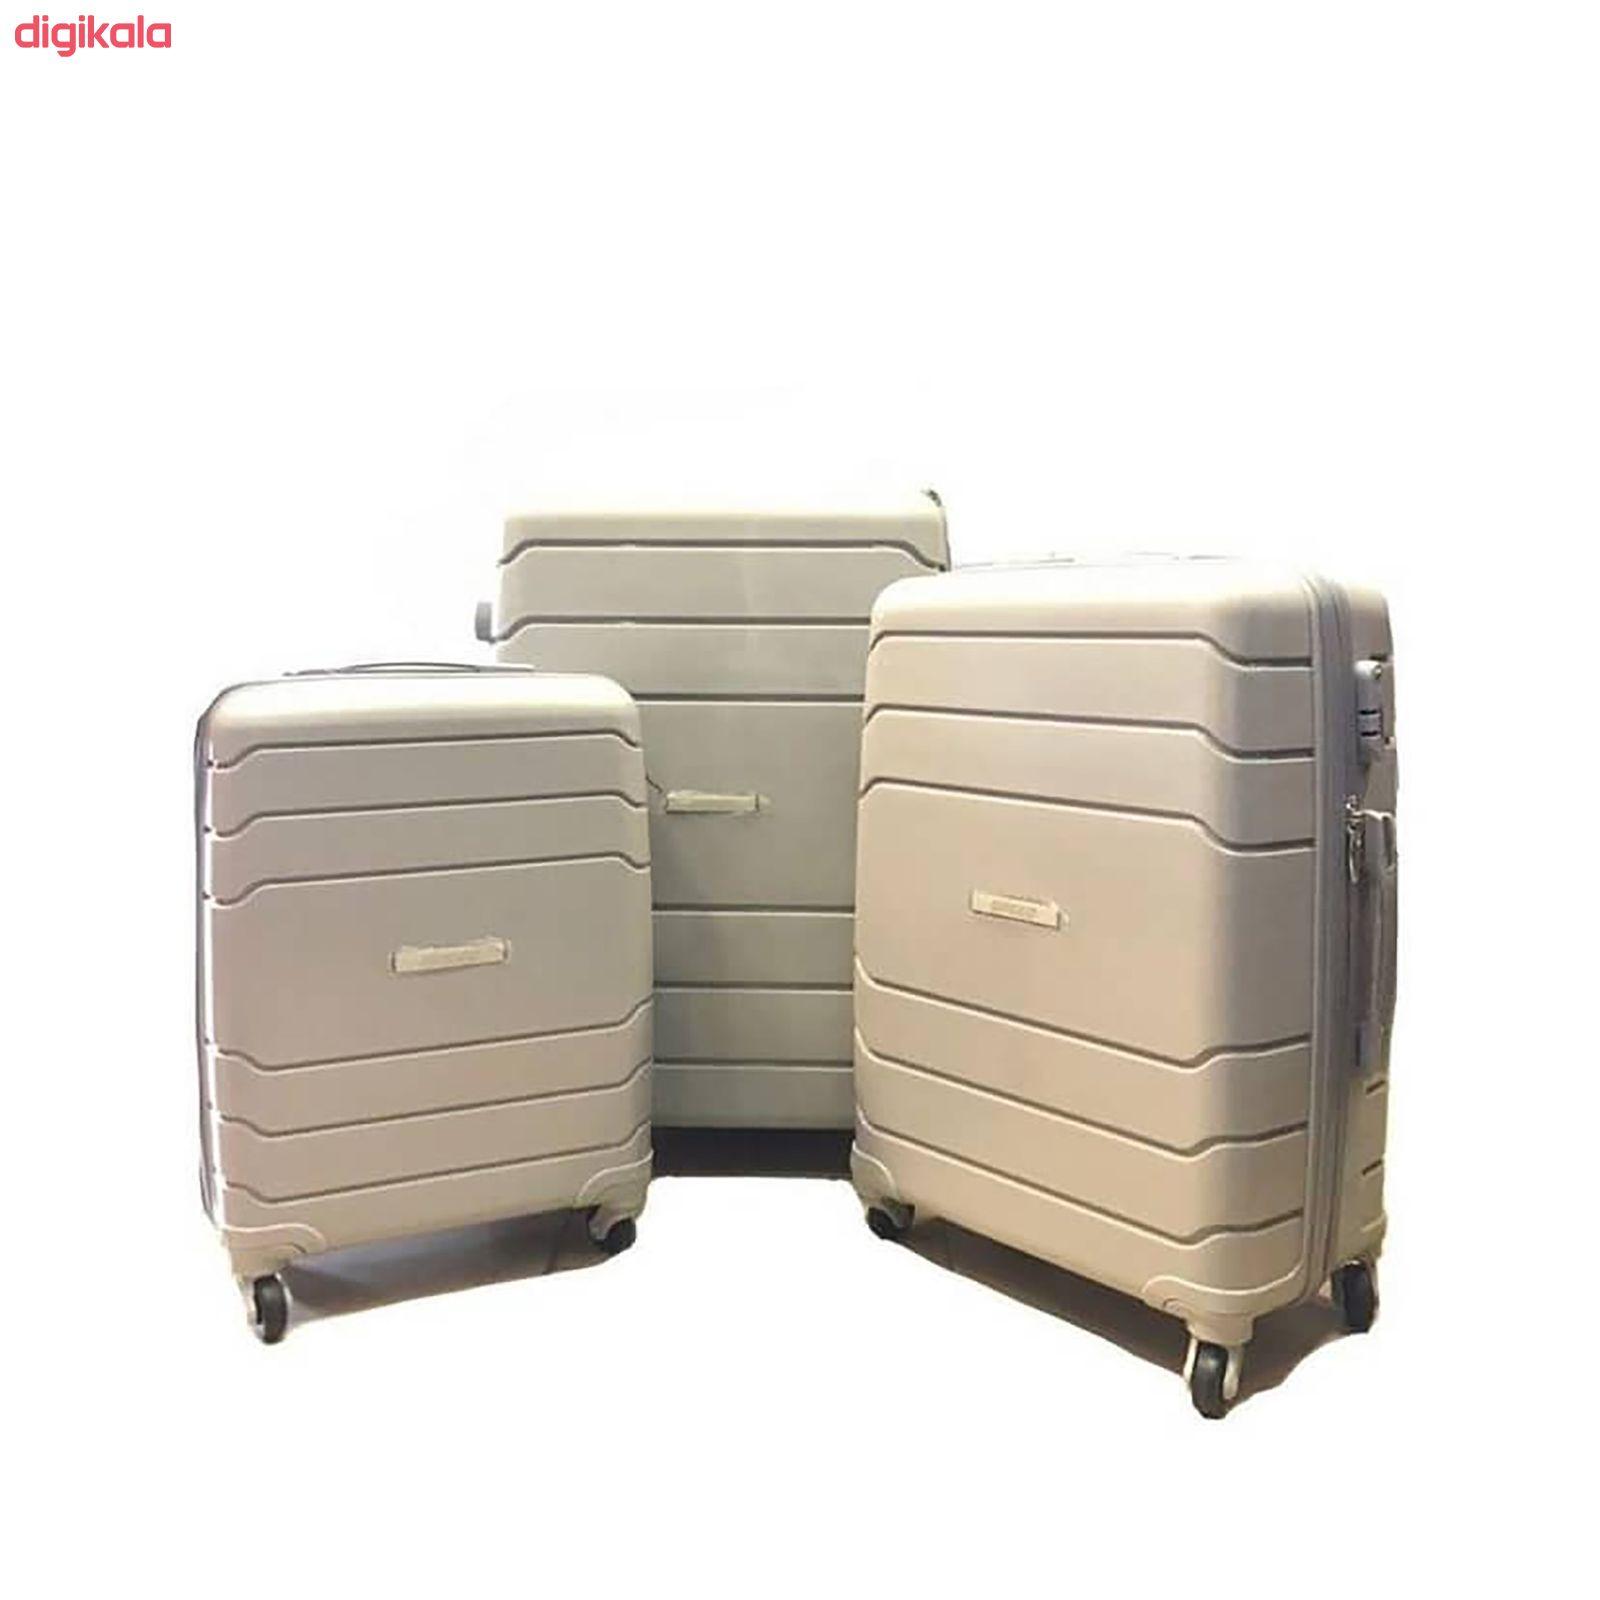 مجموعه سه عددی چمدان اسپید کد B016 main 1 4